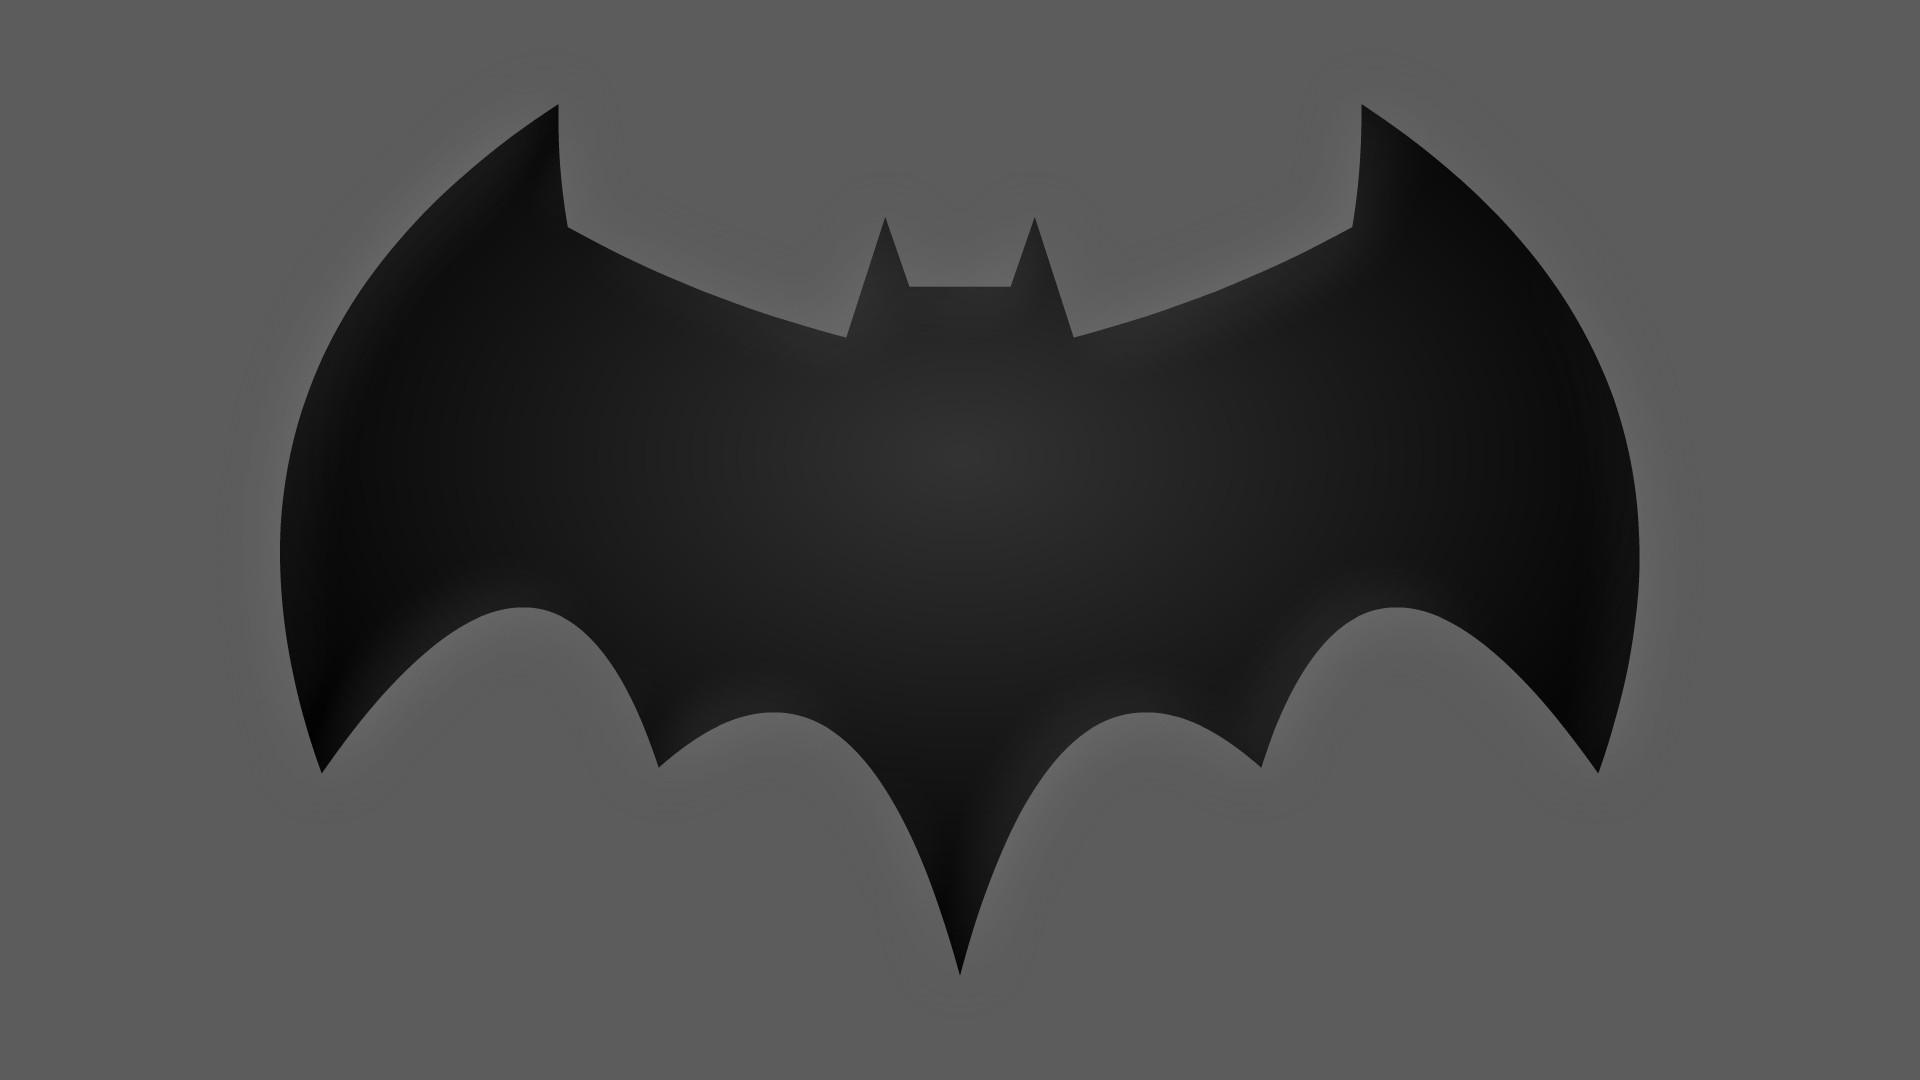 Telltale Batman Wallpaper?